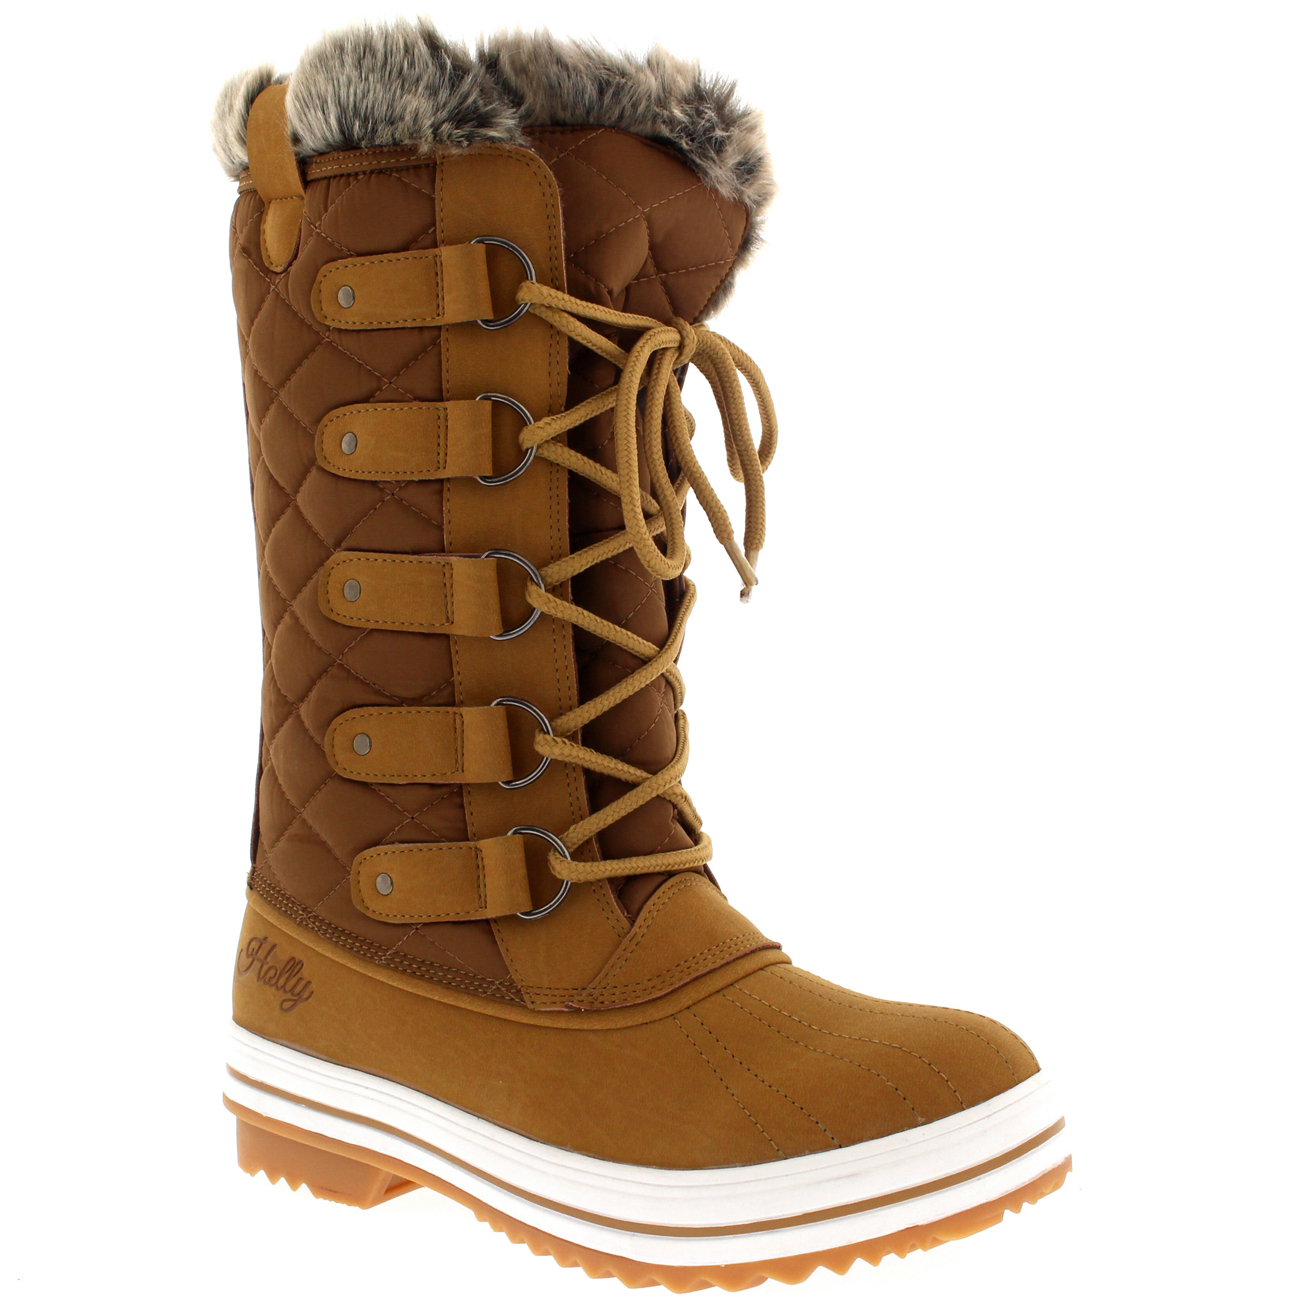 Womens Snow Boot Nylon Tall Winter Snow Waterproof Fur Lined Warm ...